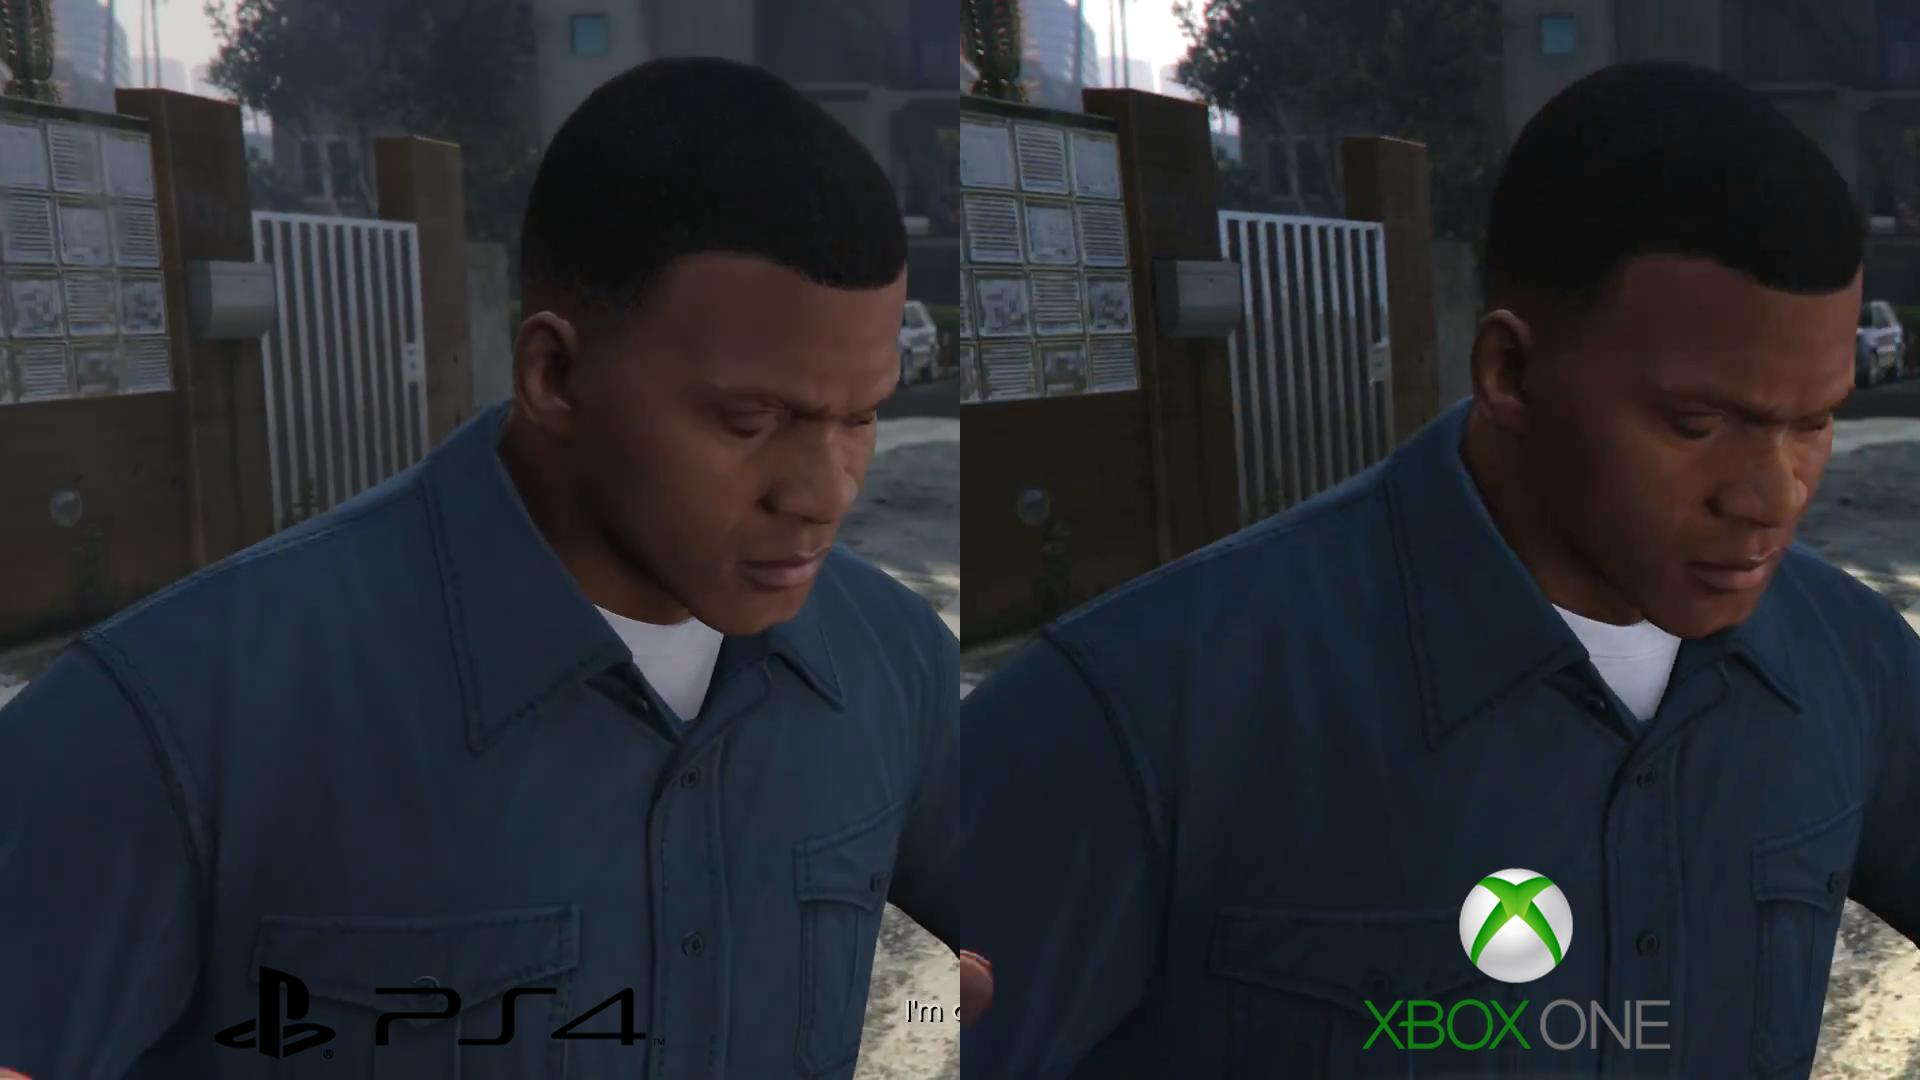 GTA V PS4 Vs Xbox One 1080p Video And Screenshot Comparison